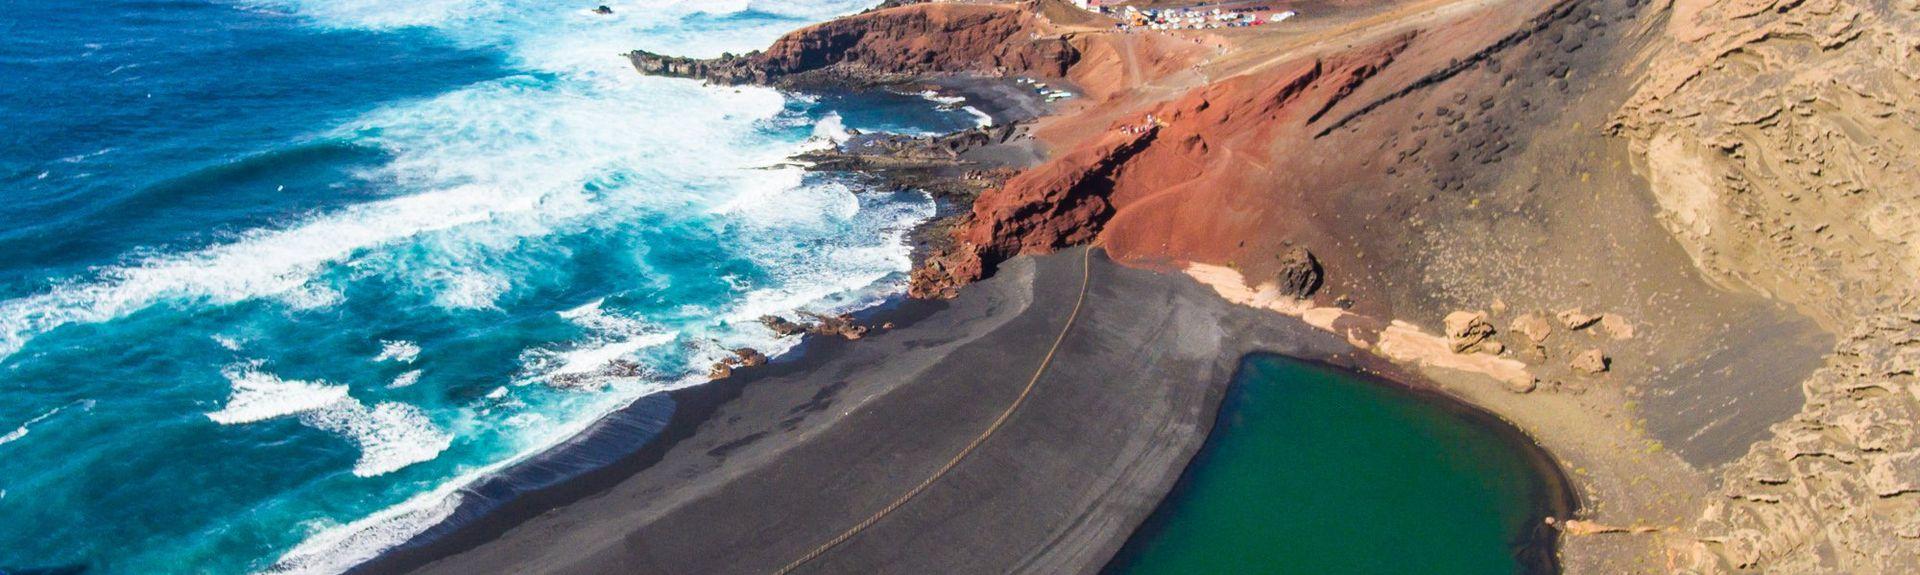 Playa Chica, Puerto del Carmen, Îles Canaries, Espagne